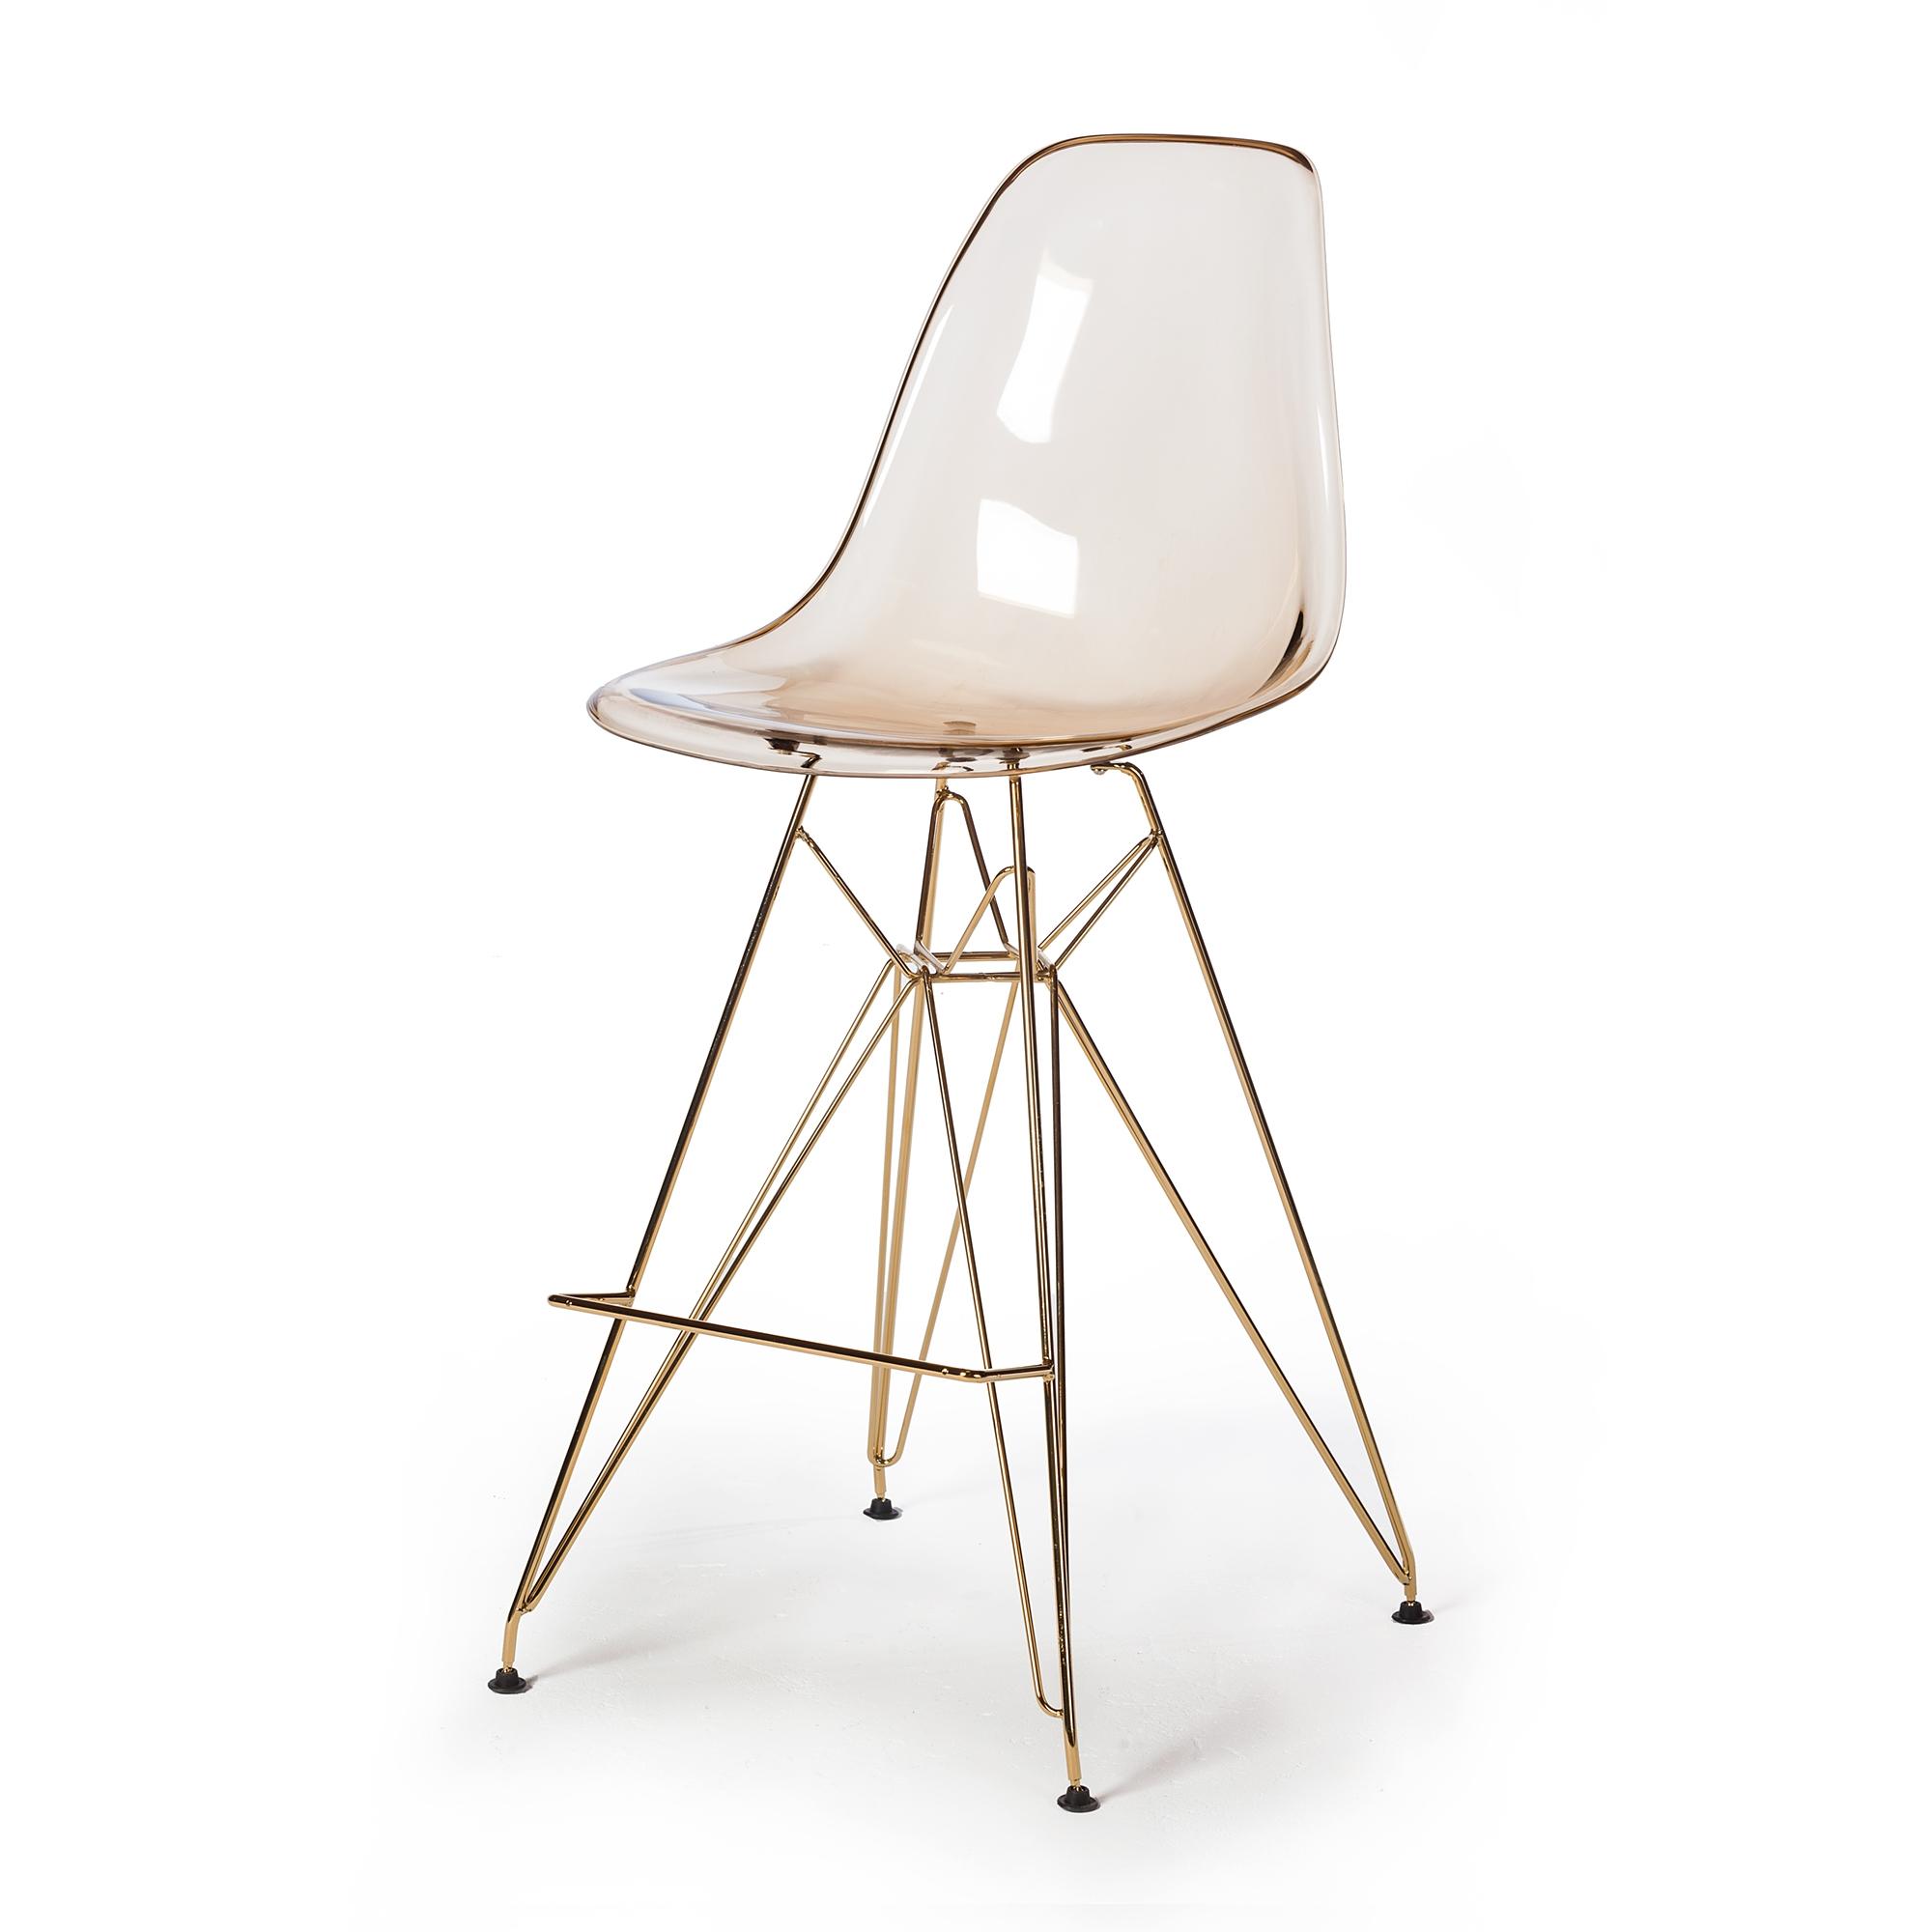 Peachy Molded Acrylic Counter Stool In Translucent Amber And Gold Finish Legs The Khazana Home Austin Furniture Store Inzonedesignstudio Interior Chair Design Inzonedesignstudiocom